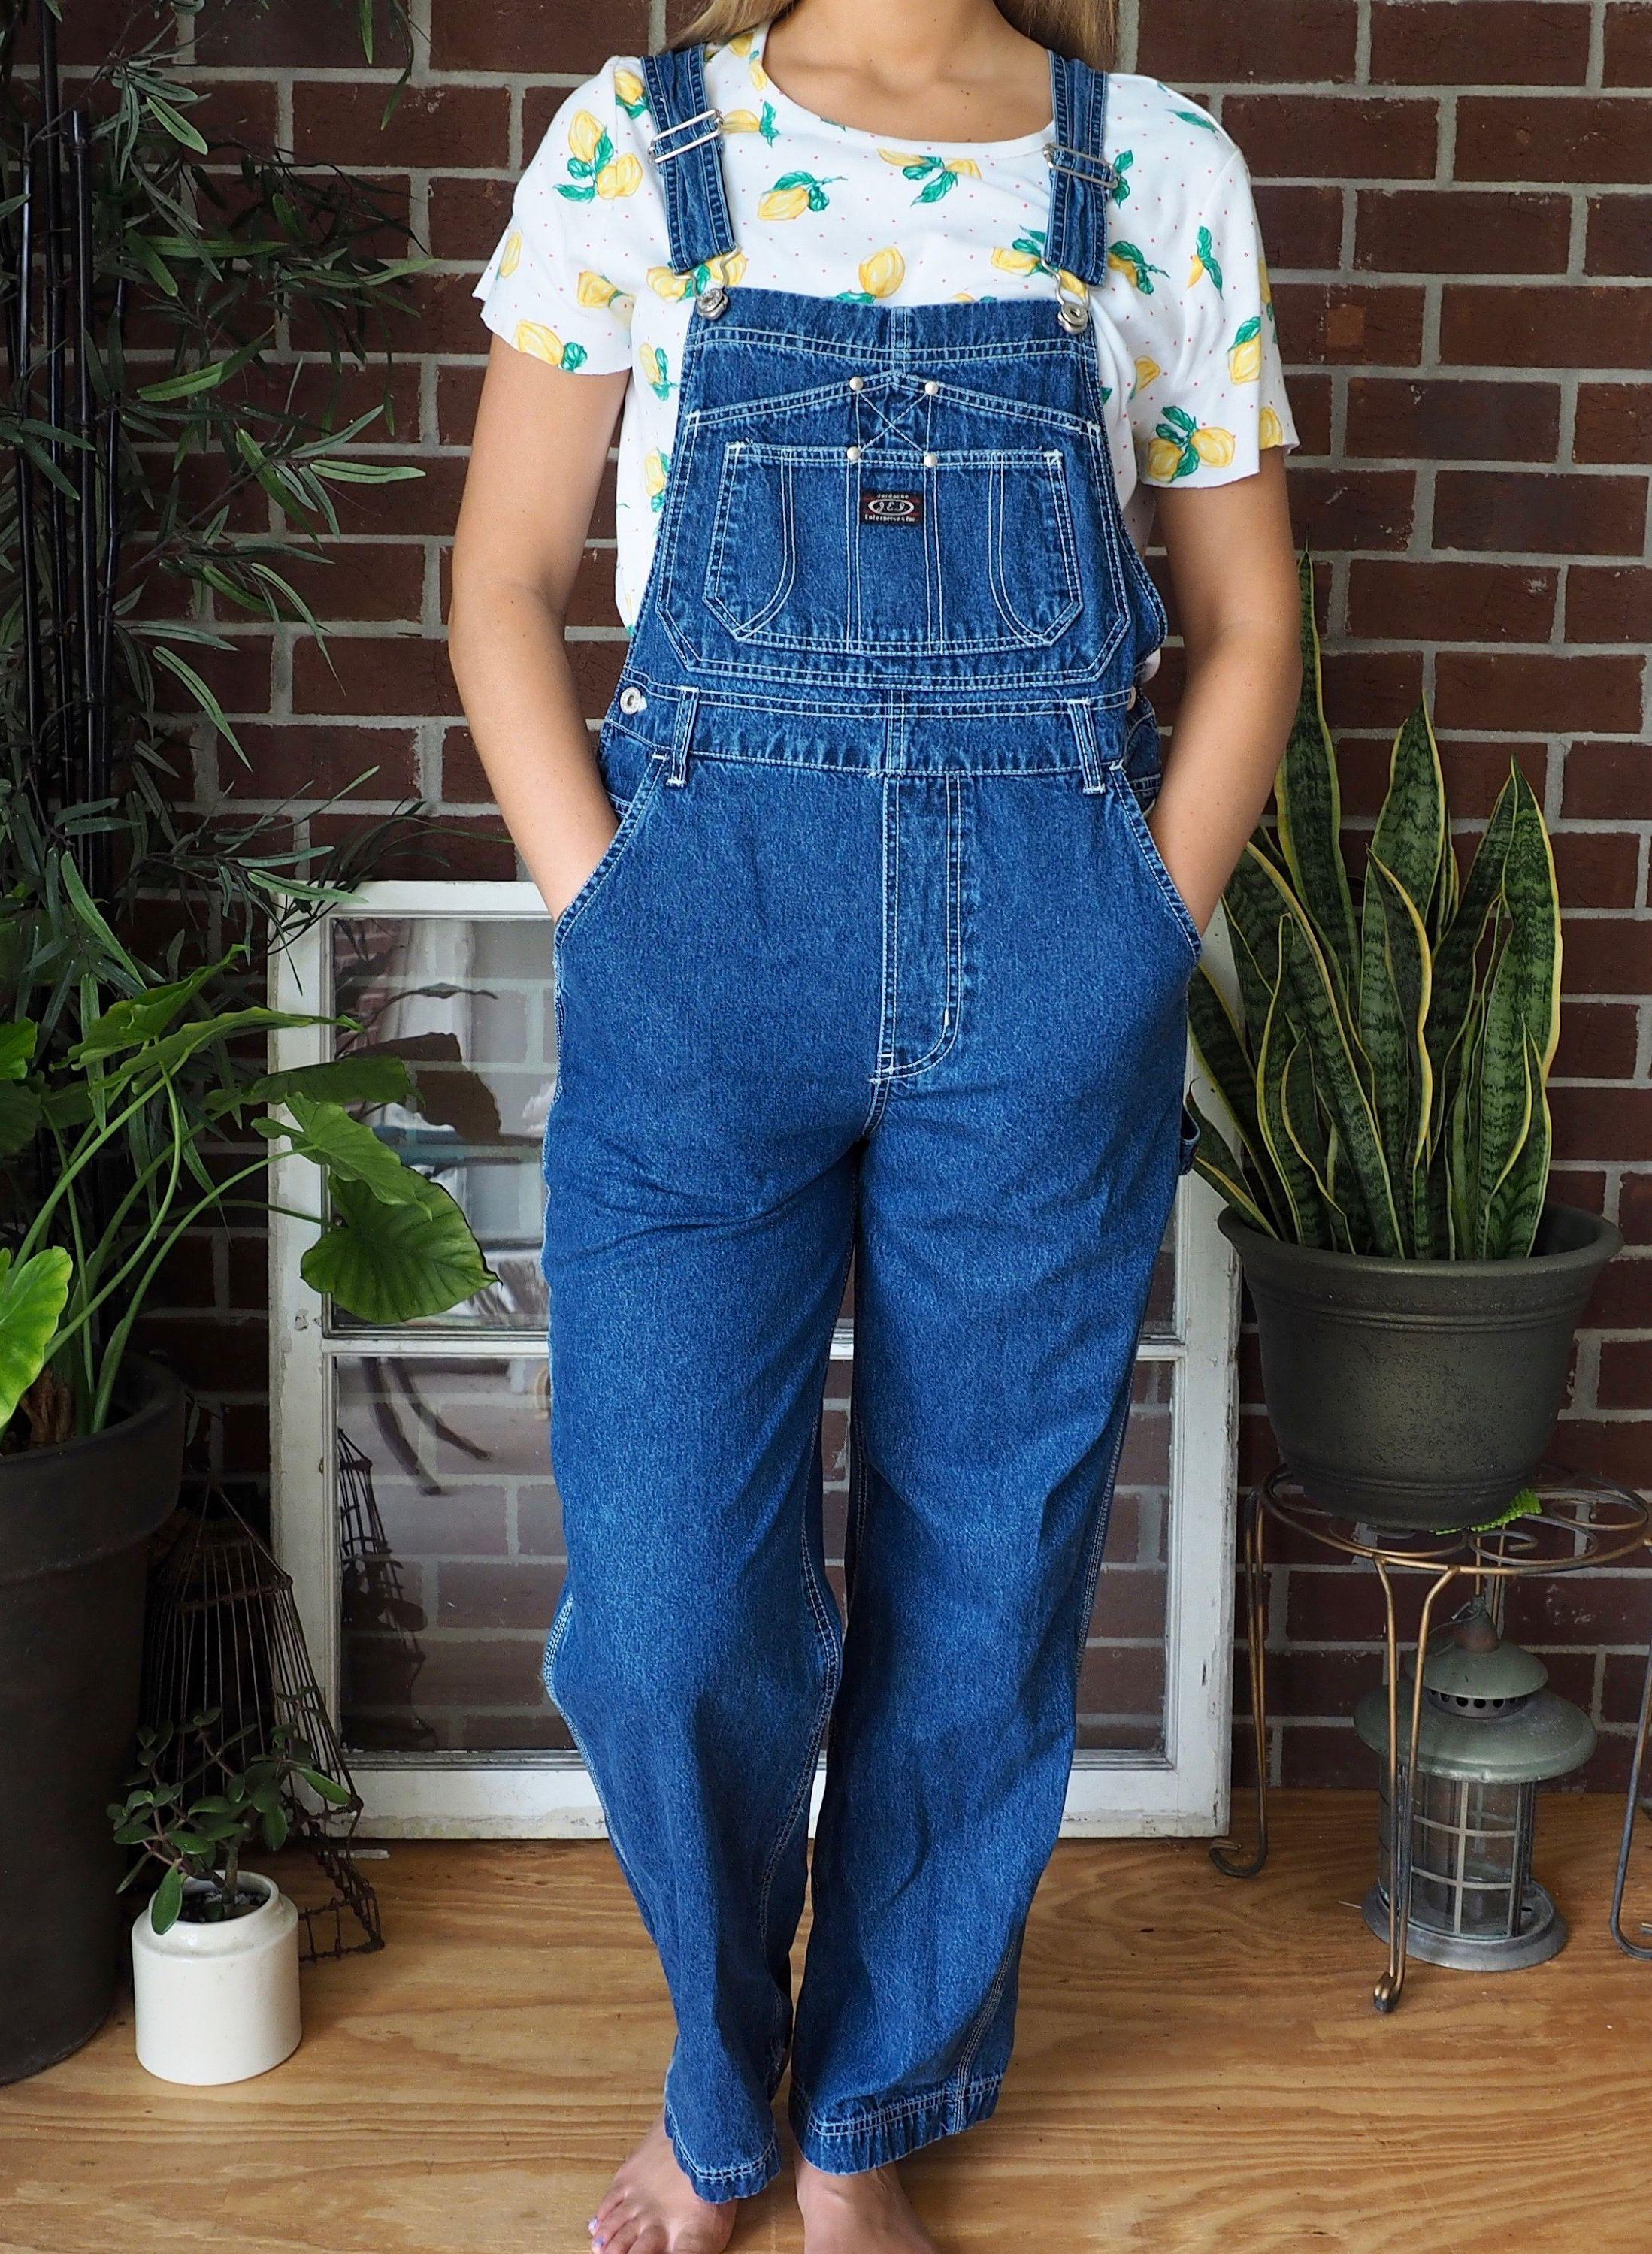 55ae2d00 90s Denim Overalls 🌷 #90sstyle #90soveralls #90sgrunge #vintageoveralls  #vintagejeans #streetwear